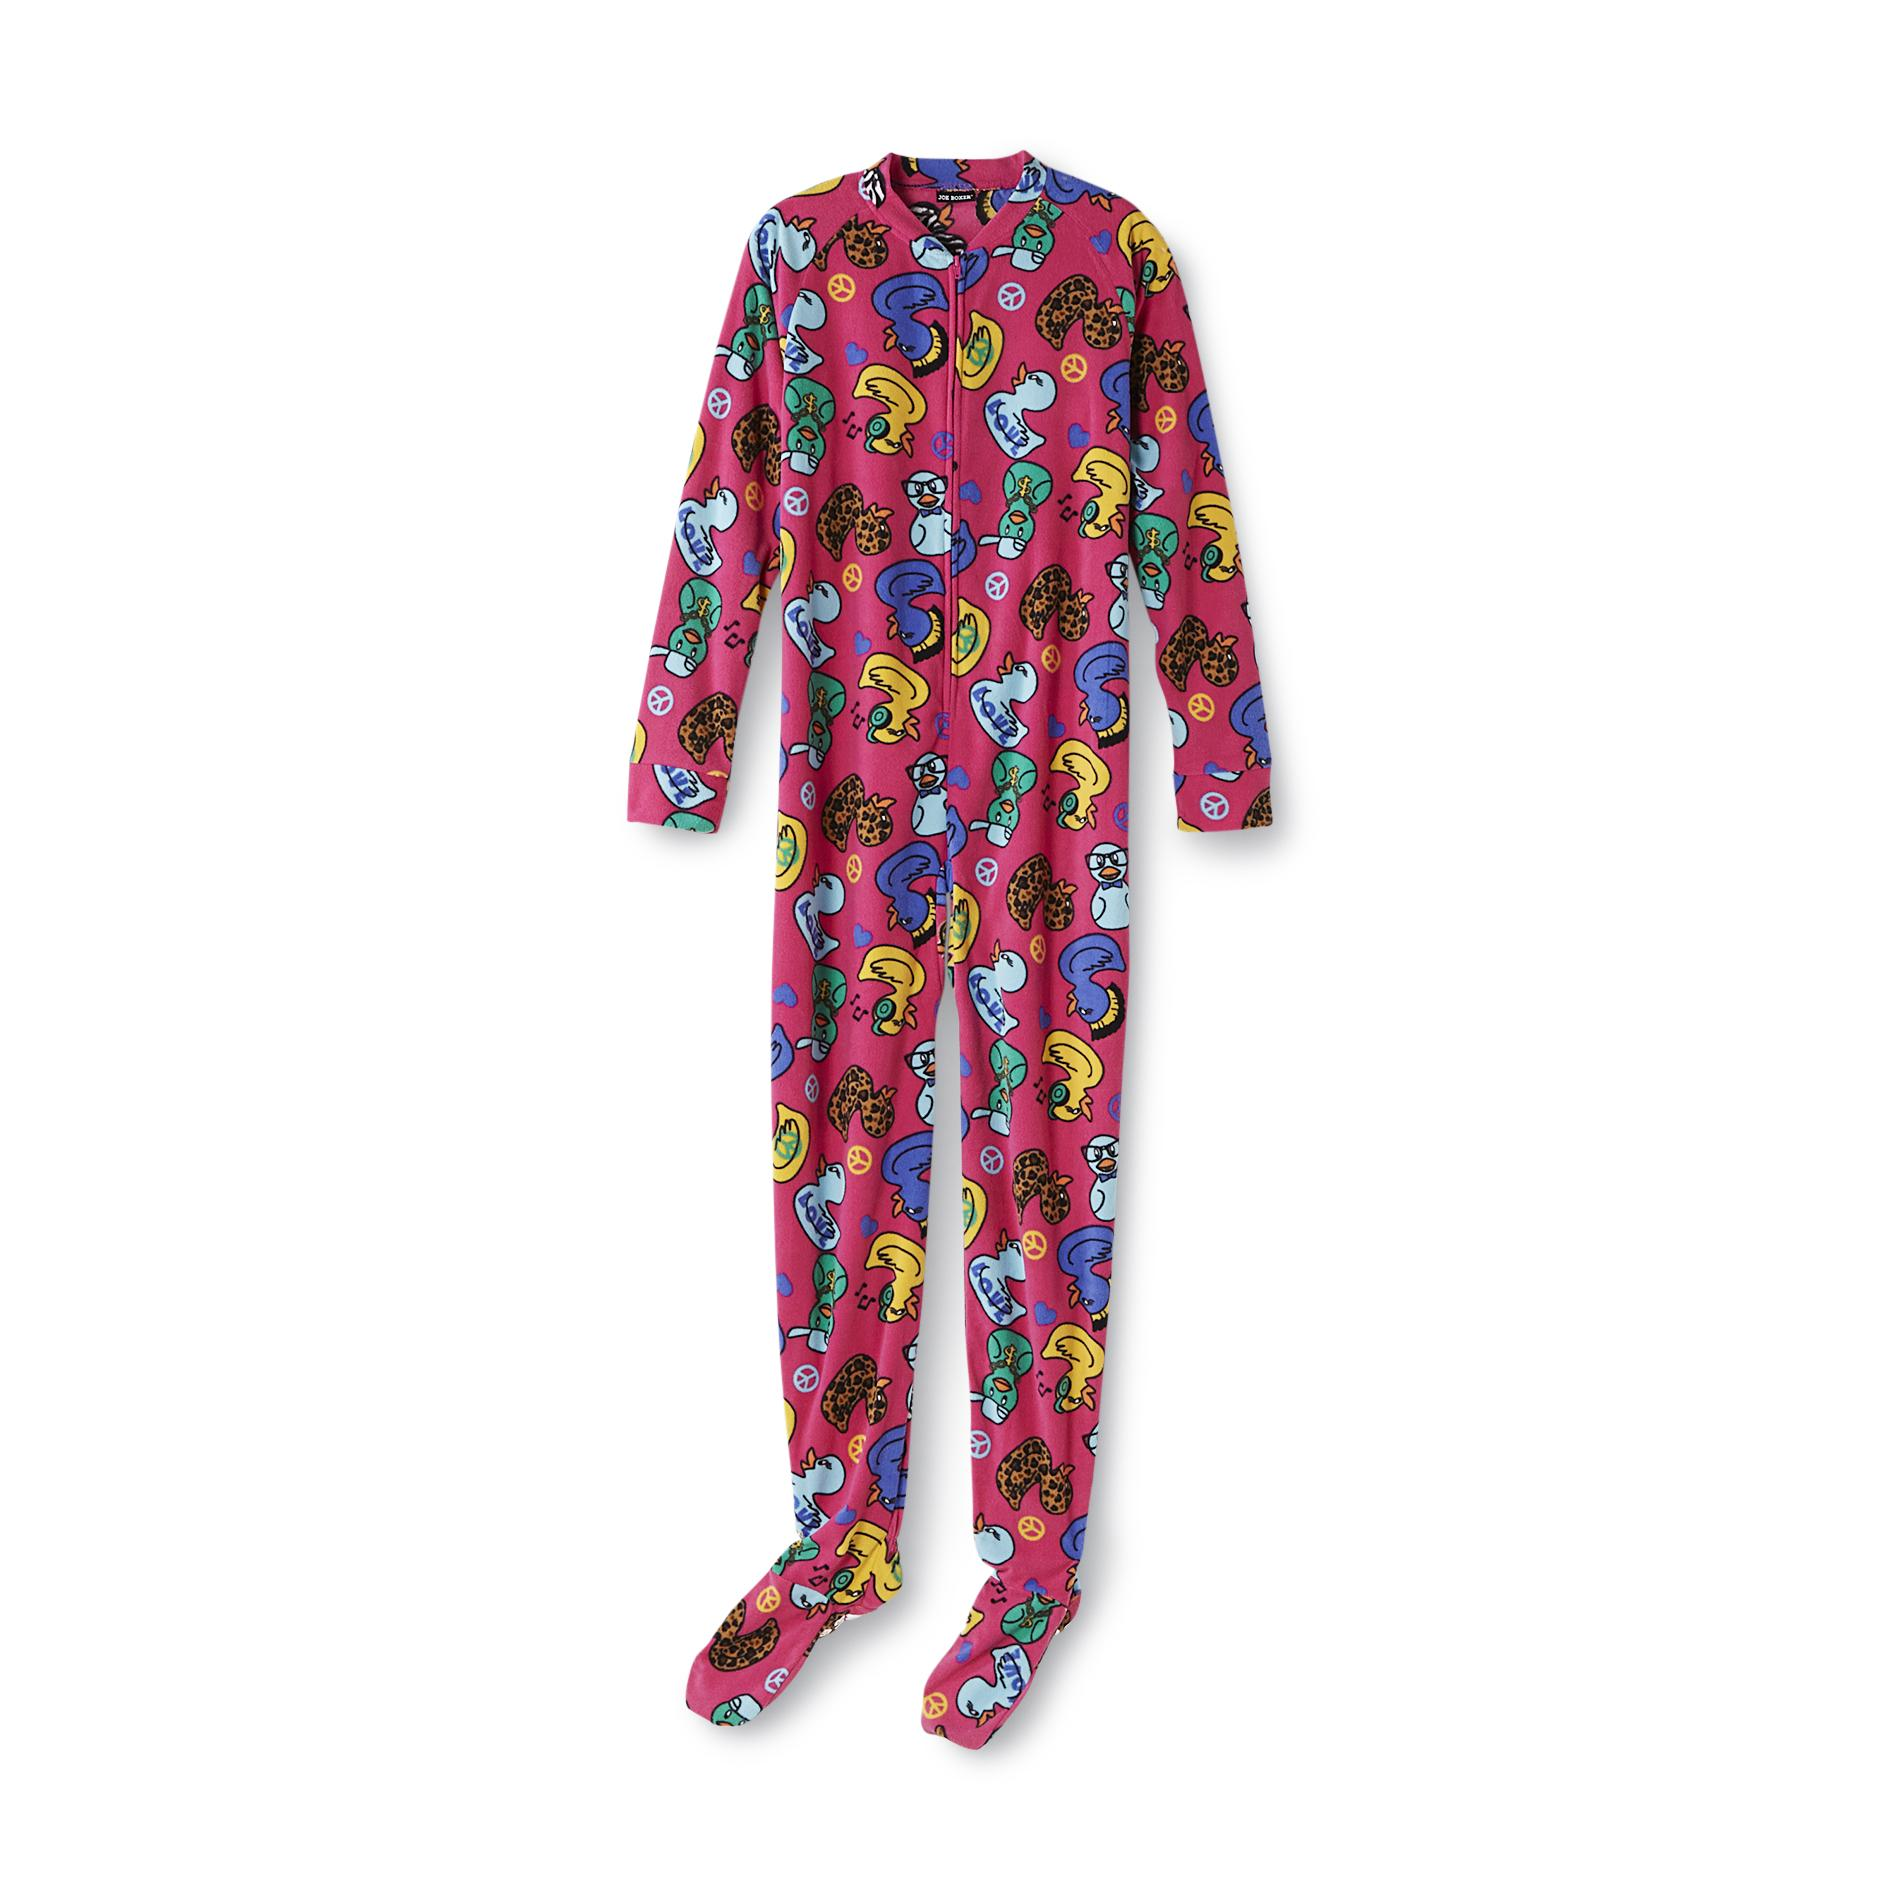 Joe Boxer Women' Fleece Footed Pajamas - Ducks